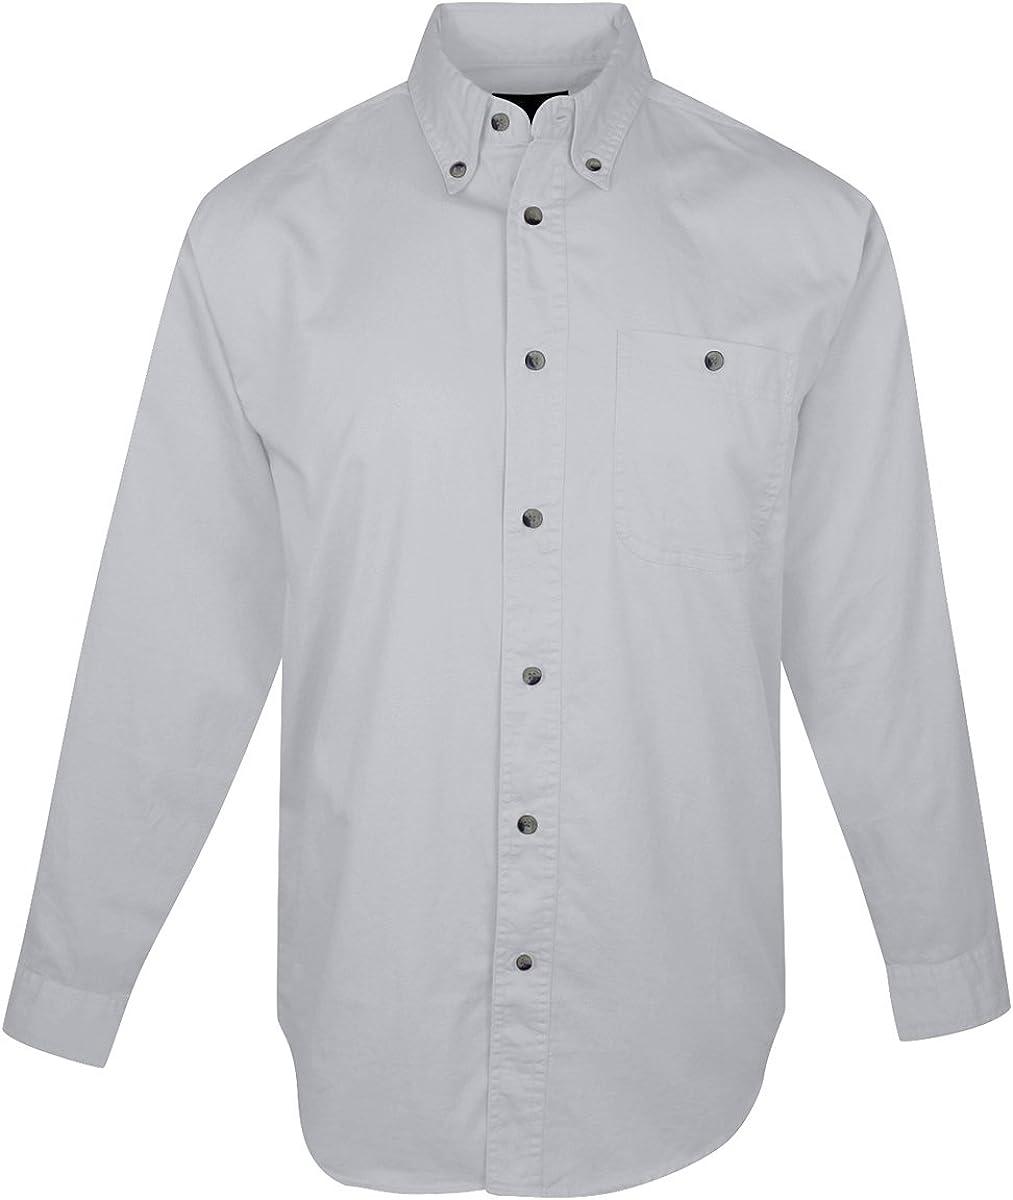 Tri-Mountain Big and Tall 6 oz. Cotton Long Sleeve Twill Shirt Light Gray